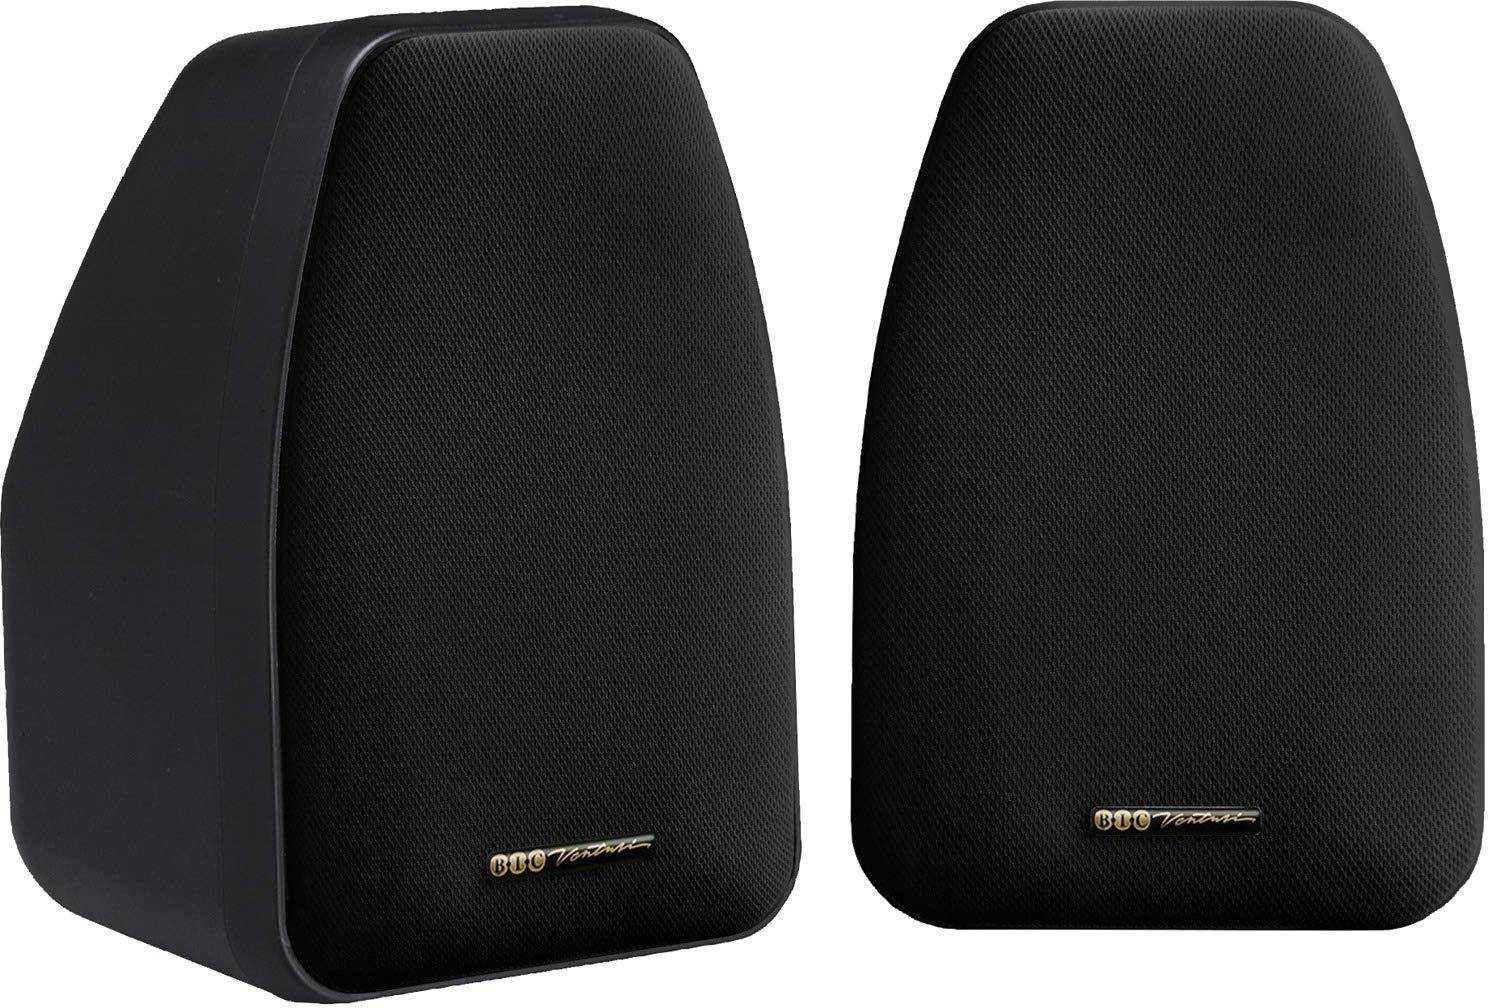 "BIC America Adatto DV52si 125W 2 Way 5 ¼"" Bookshelf Surround Speakers zoom image"